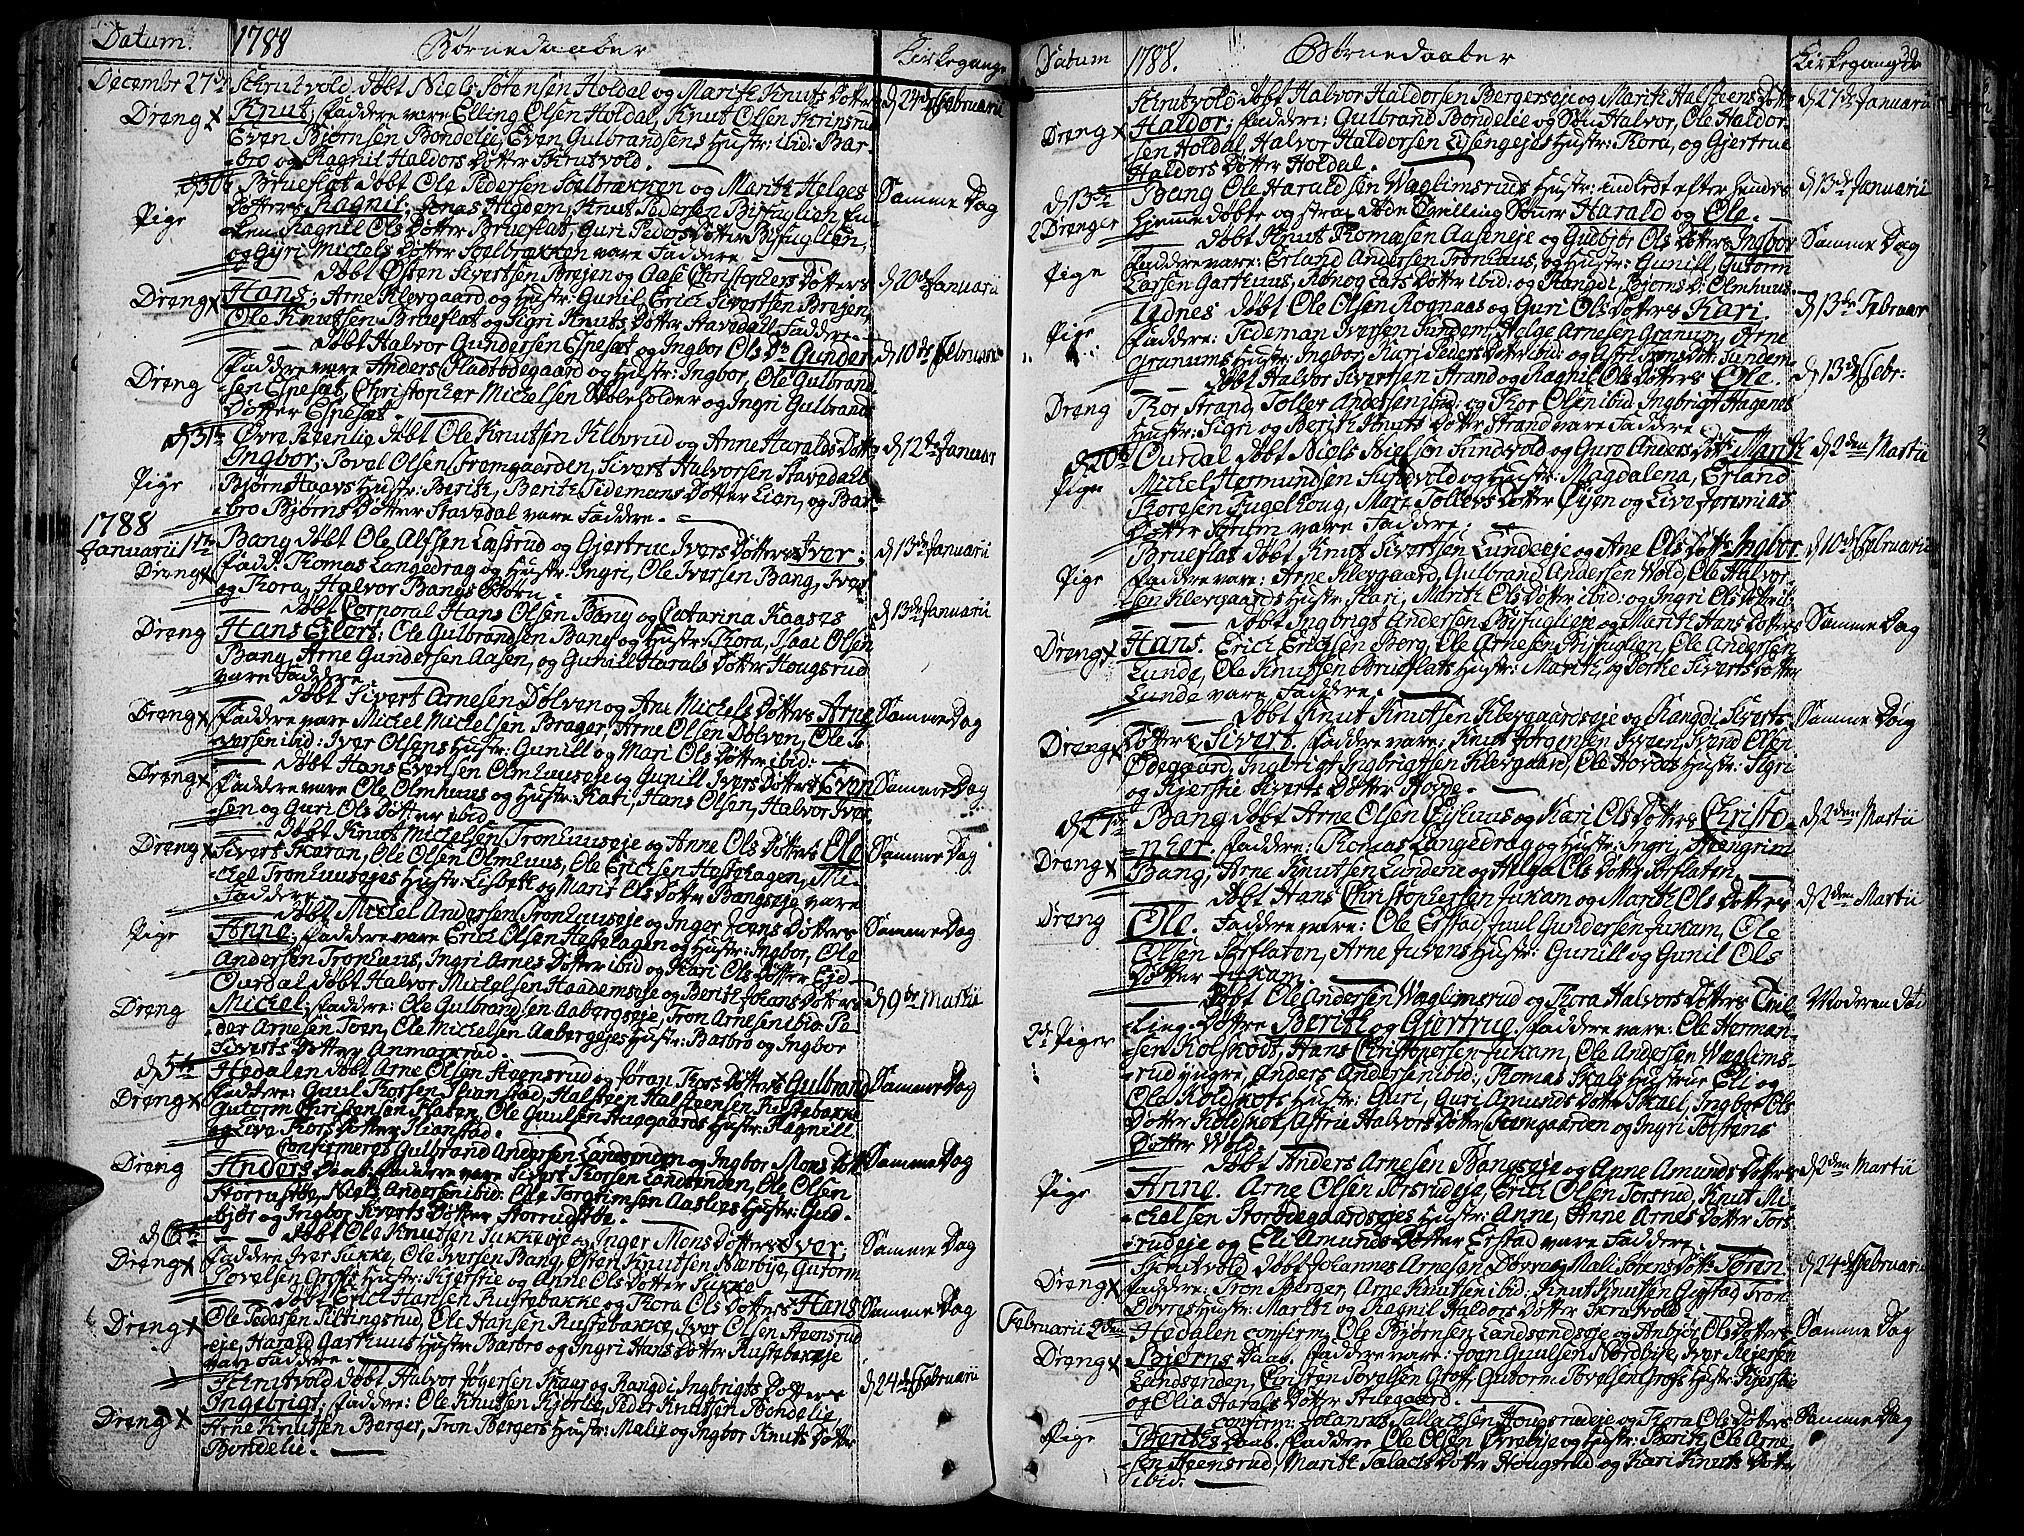 SAH, Aurdal prestekontor, Ministerialbok nr. 6, 1781-1804, s. 39